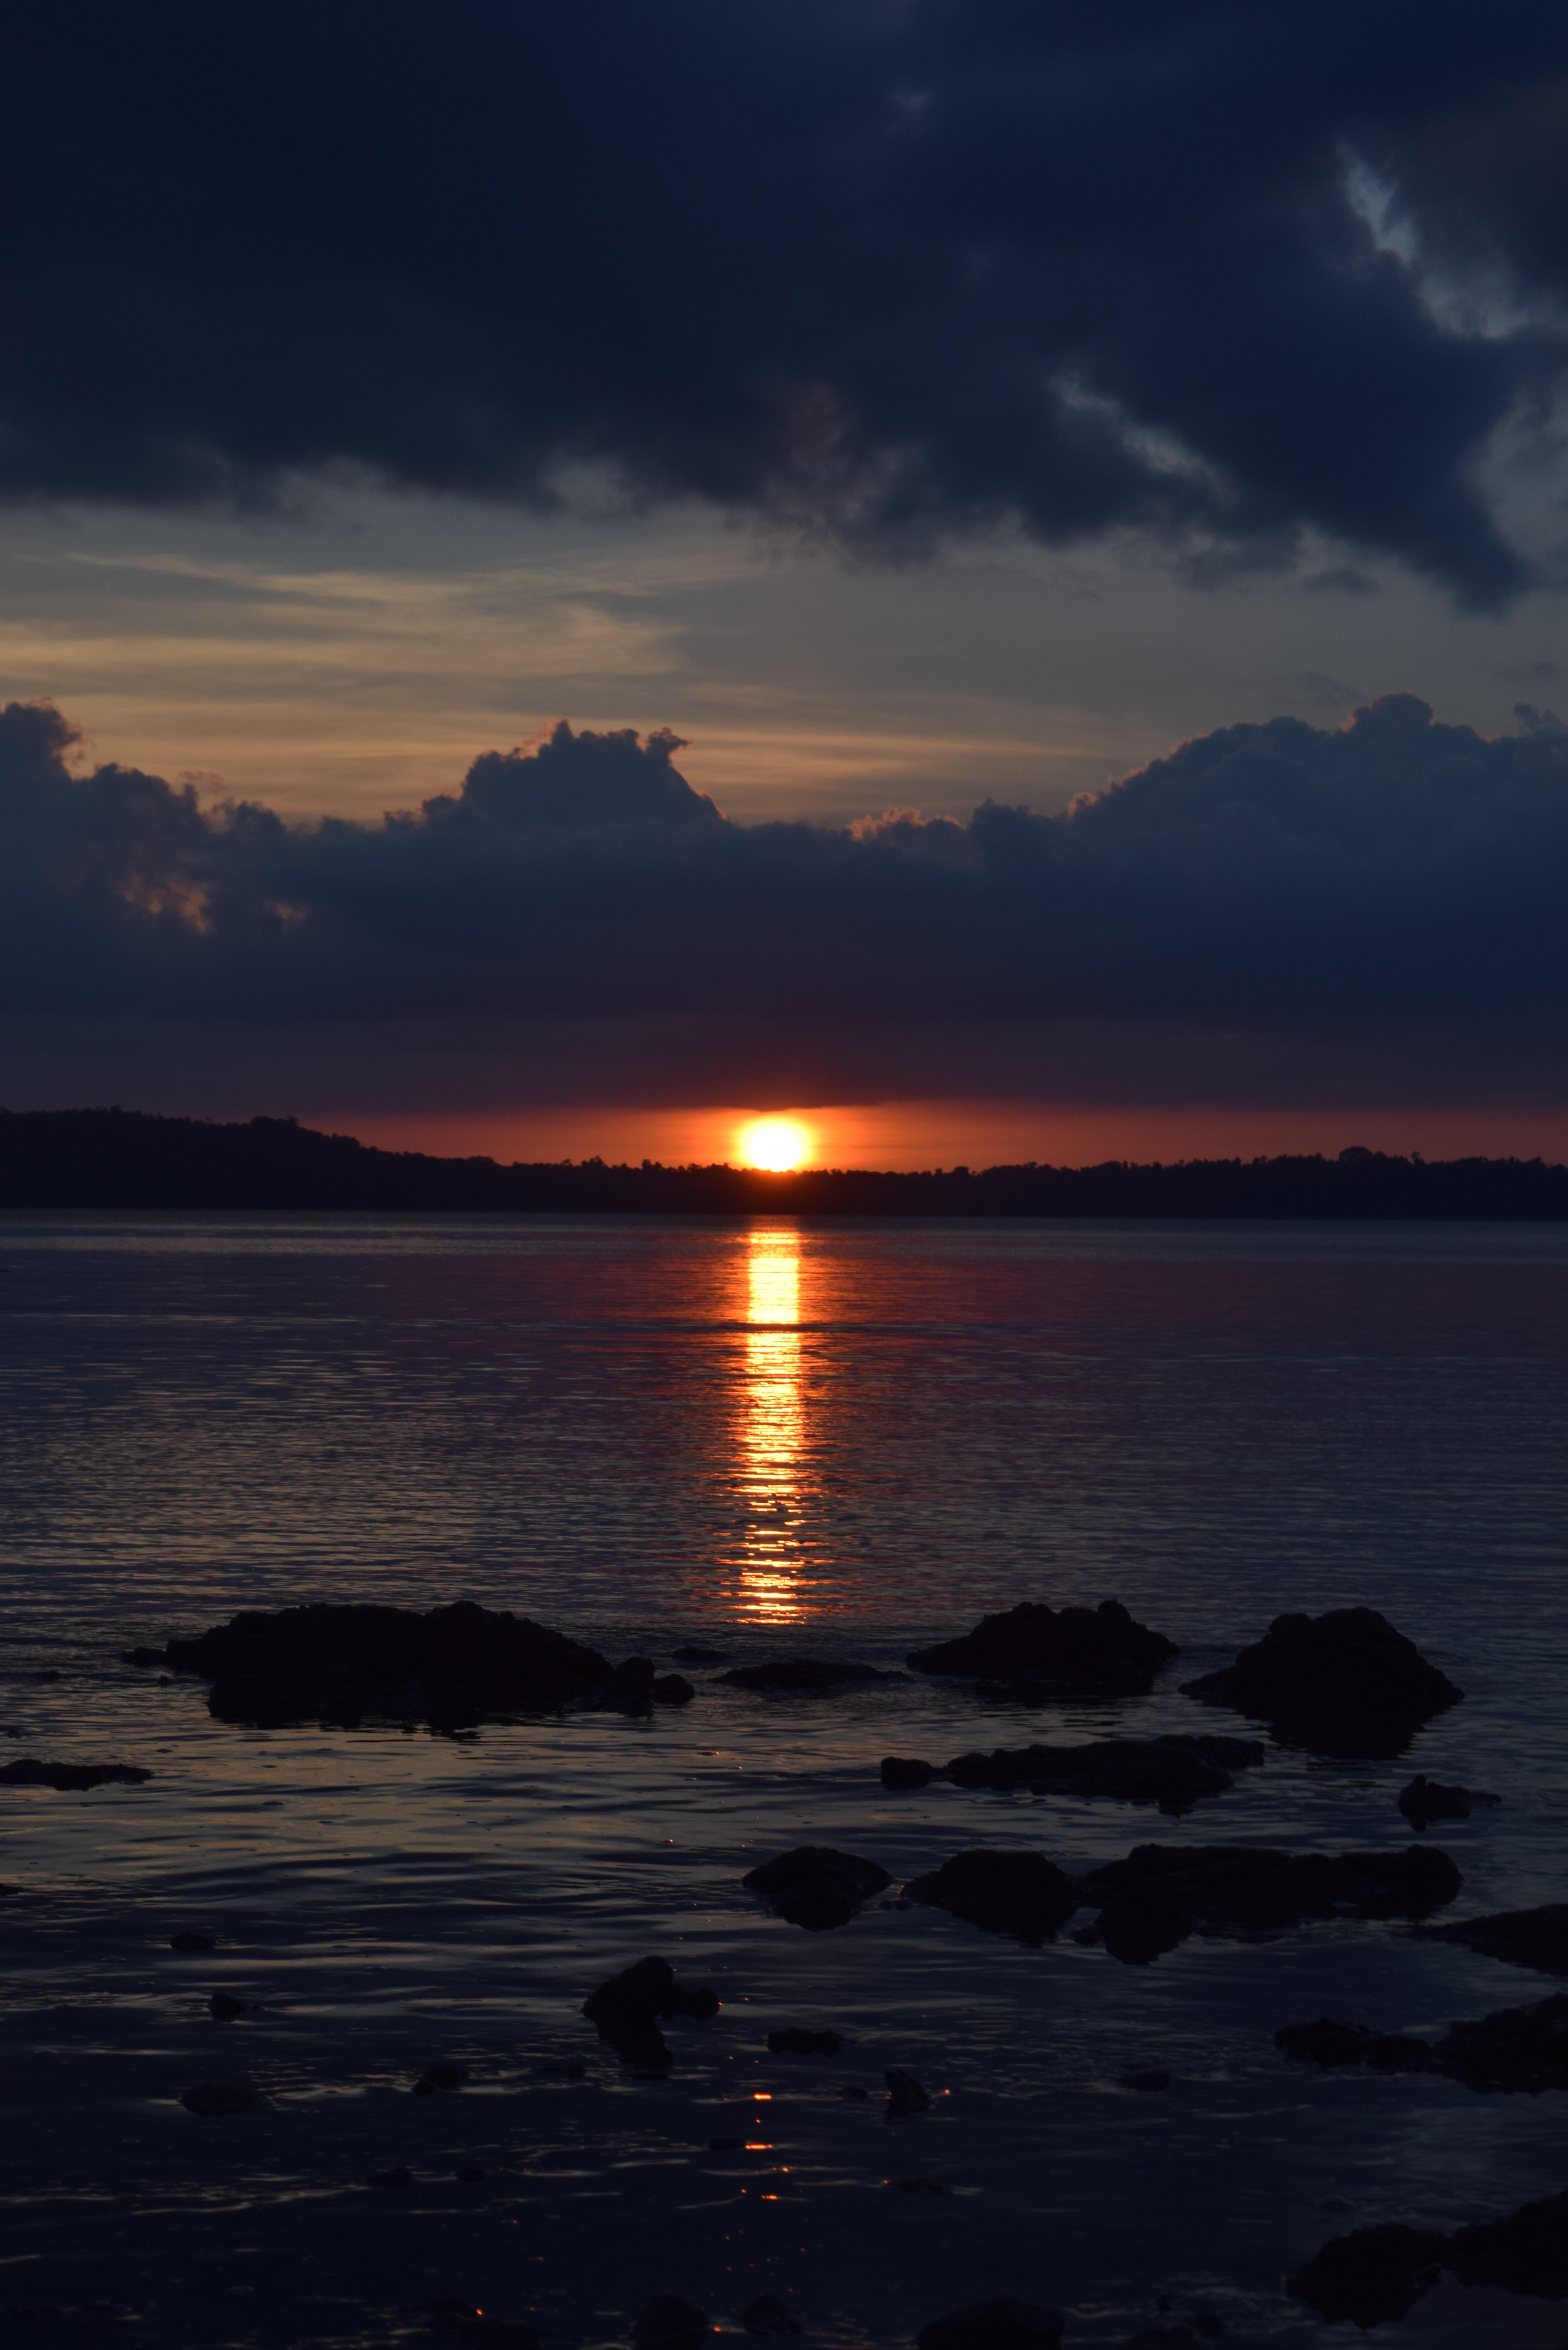 Pexels Photo   Cs Srgb   Dl Clouds Ocean Evening Sun further Deep Space X Nebula Stars Hd further Sunset in addition Sunflower Fields X Wind Turbine K in addition Summer Sun Rays X. on sun wallpaper hd